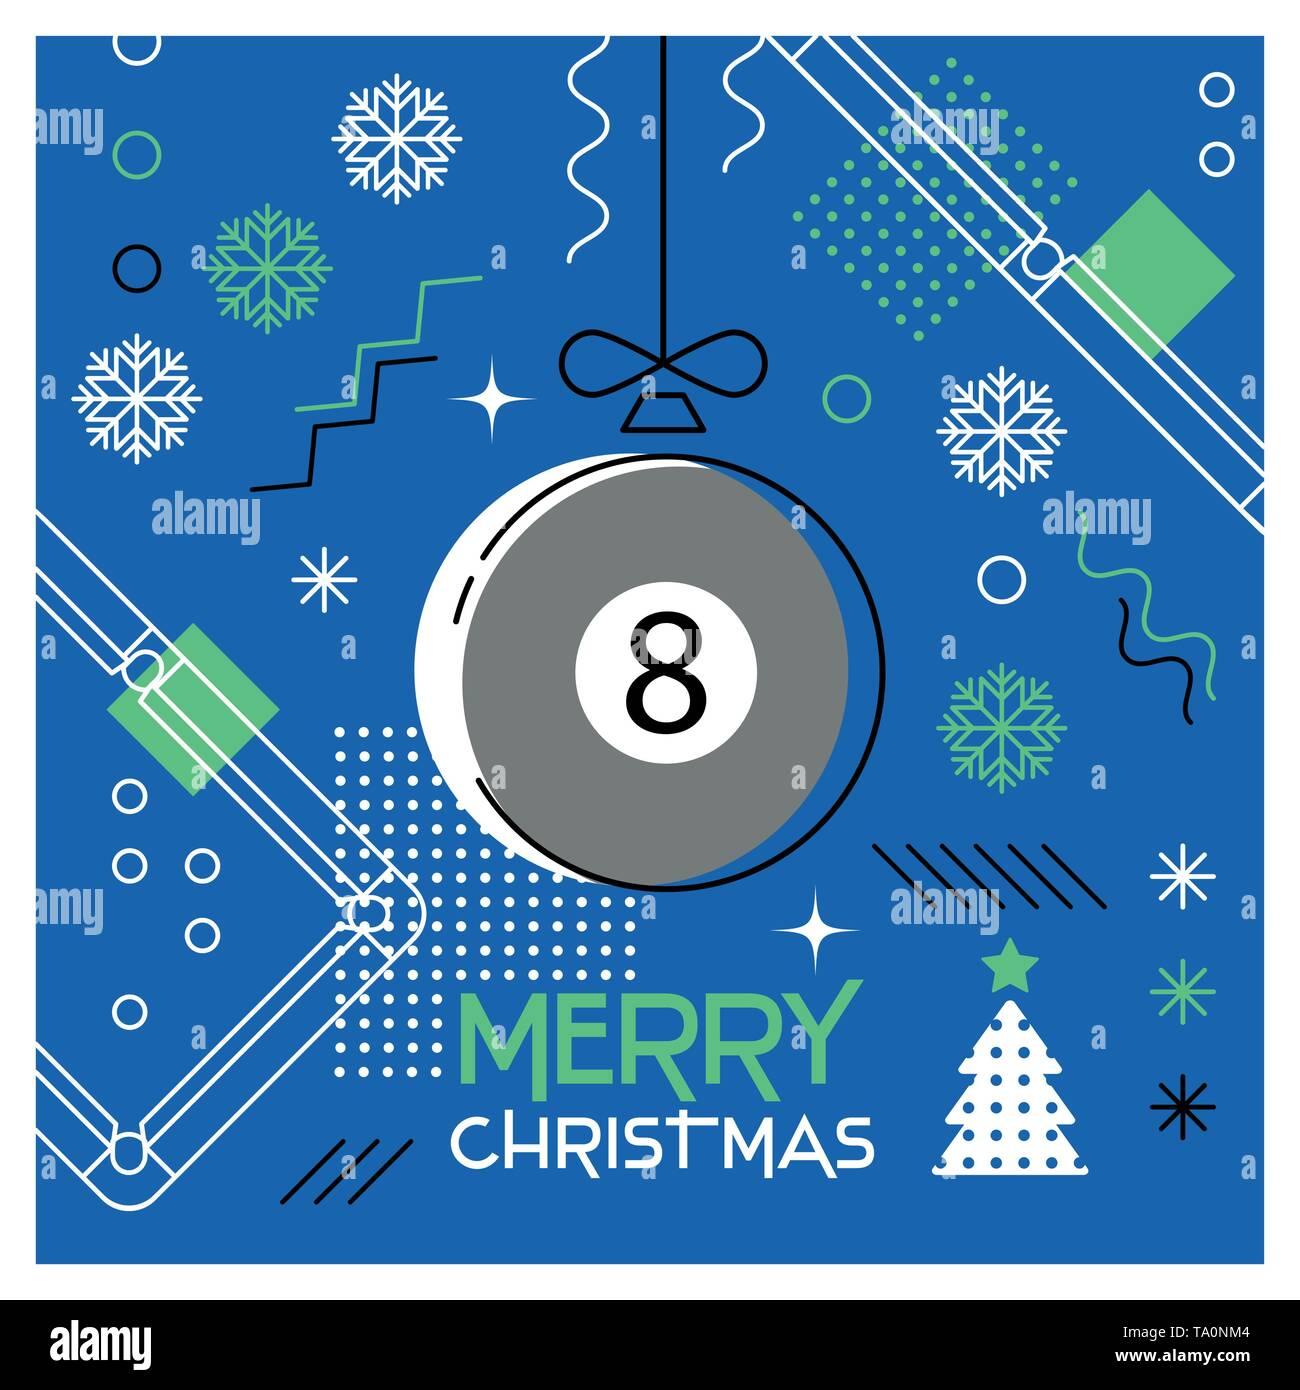 Merry Christmas. Greeting card with Christmas ball as a billiard ball. Abstract flat design. Vector illustration. - Stock Image